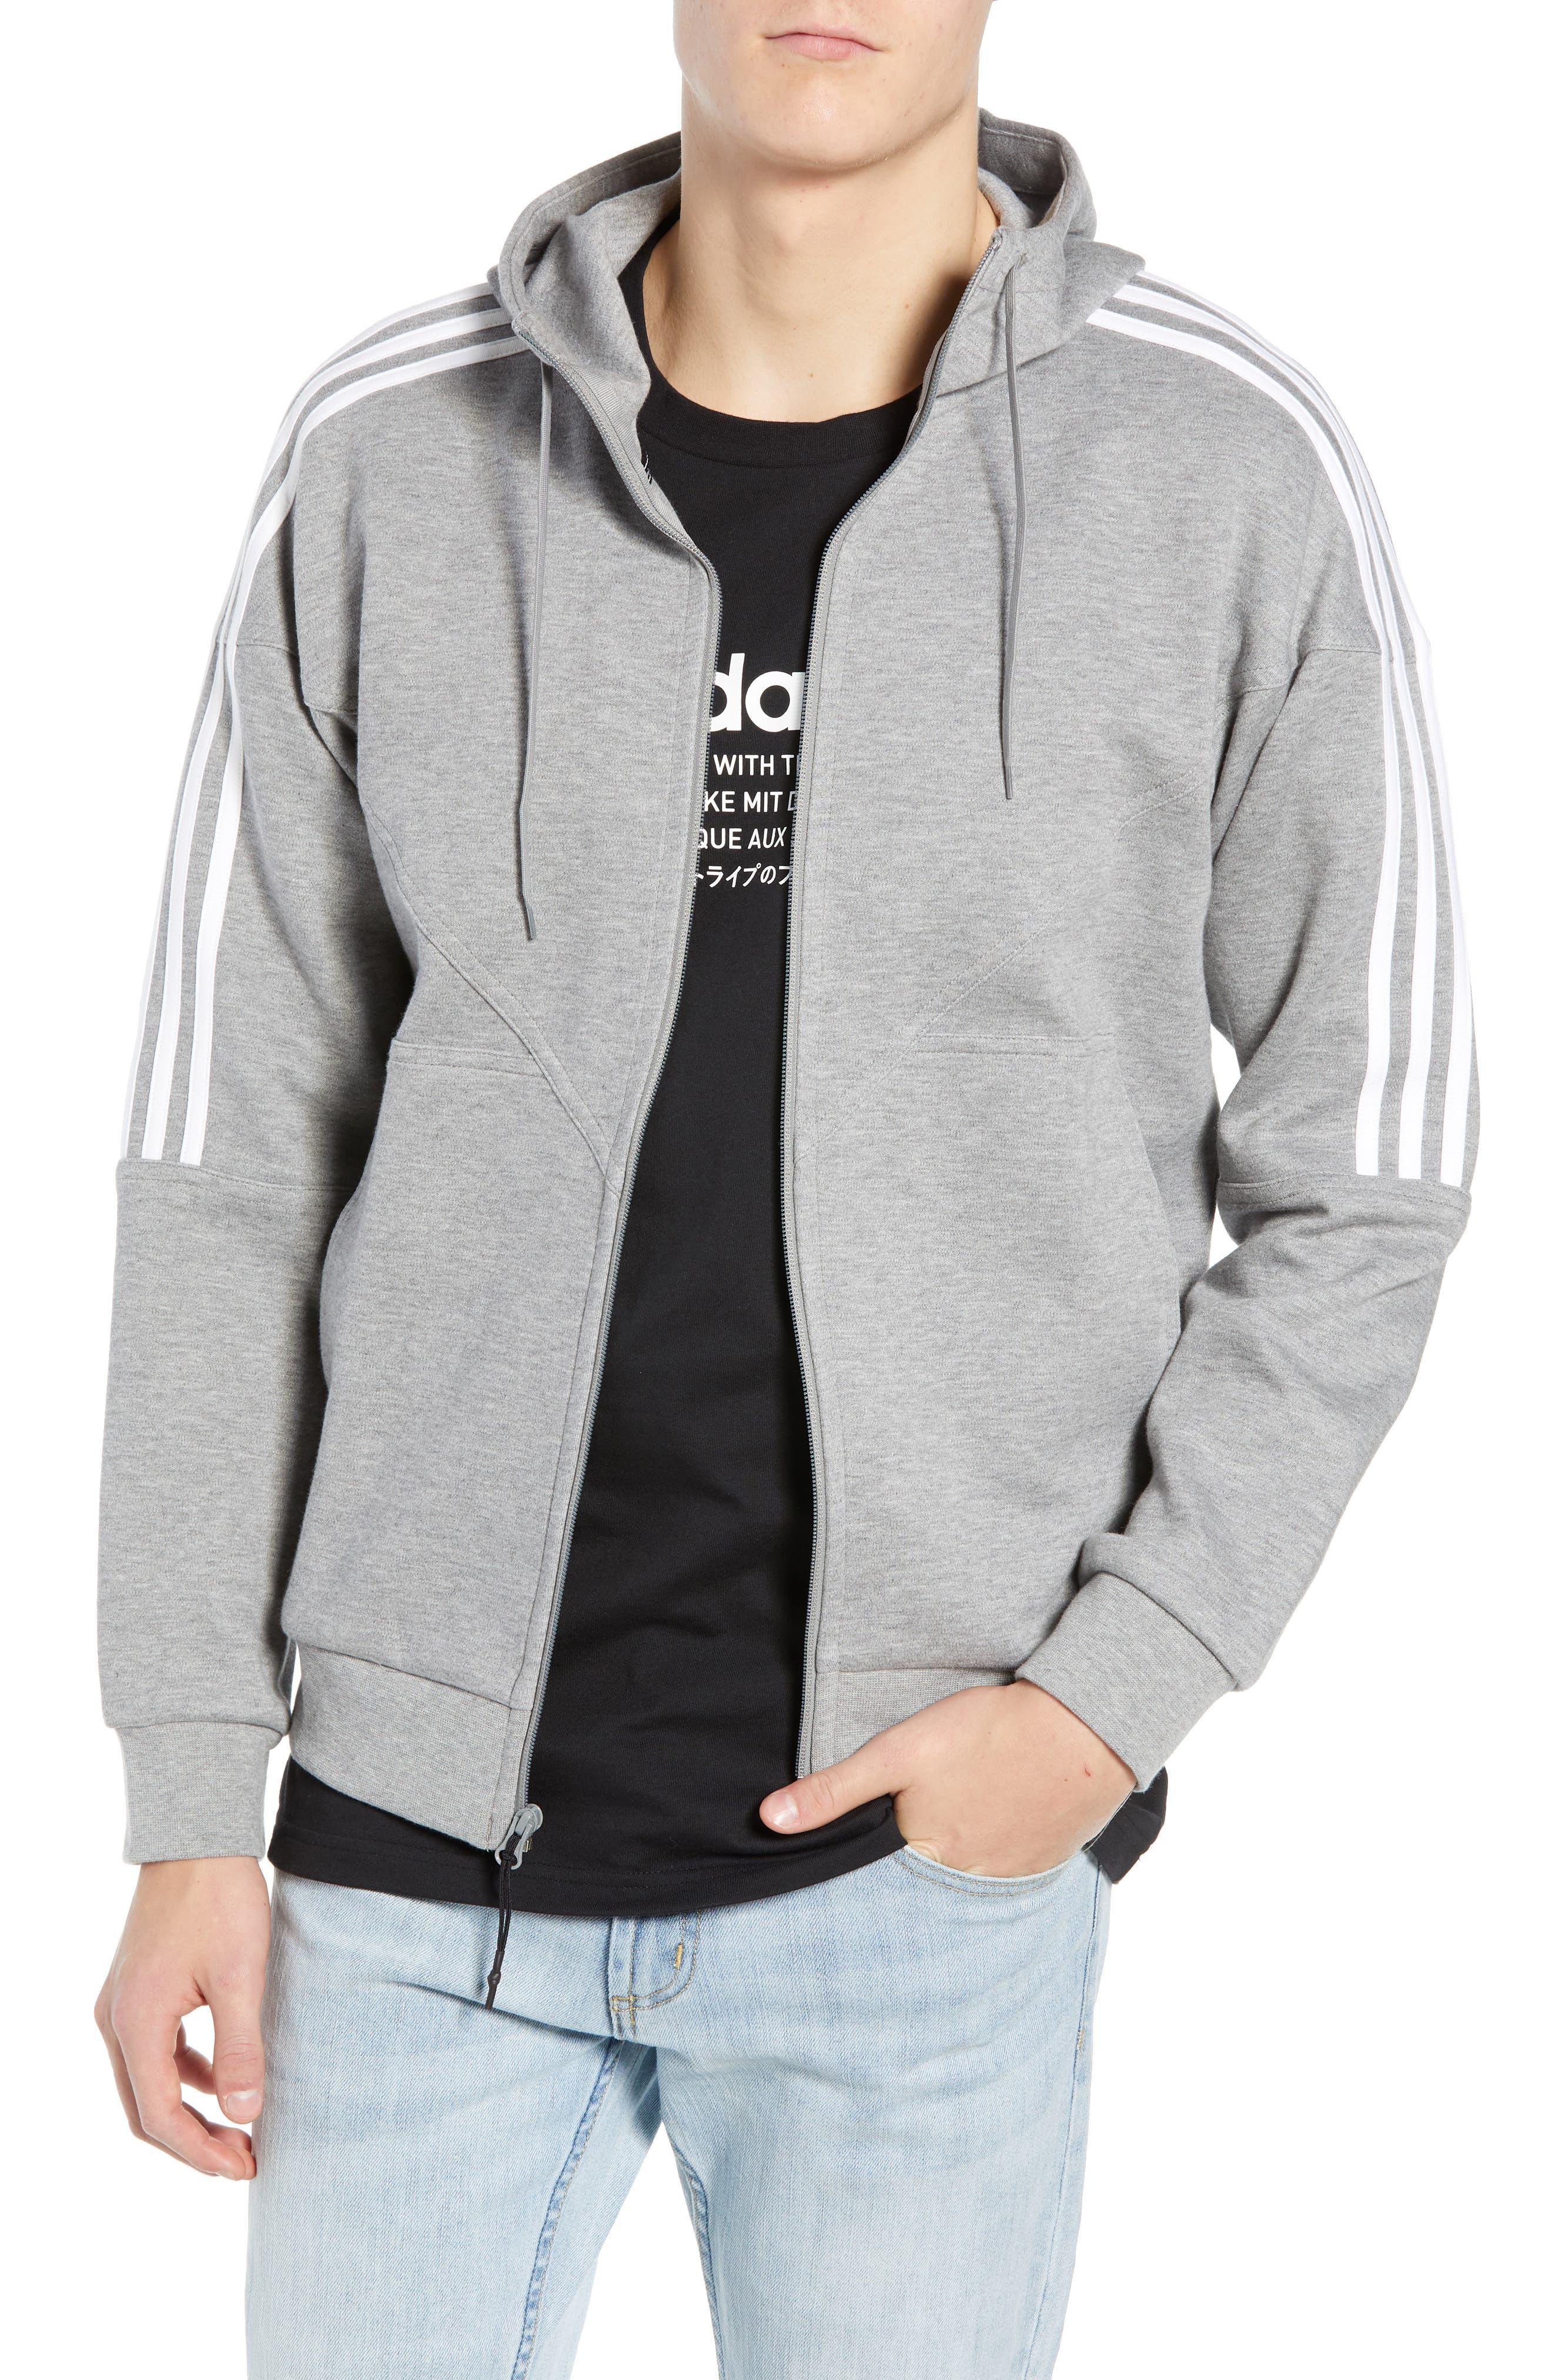 adidas NMD Zip Hoodie,                             Main thumbnail 1, color,                             MED GREY HEATHER